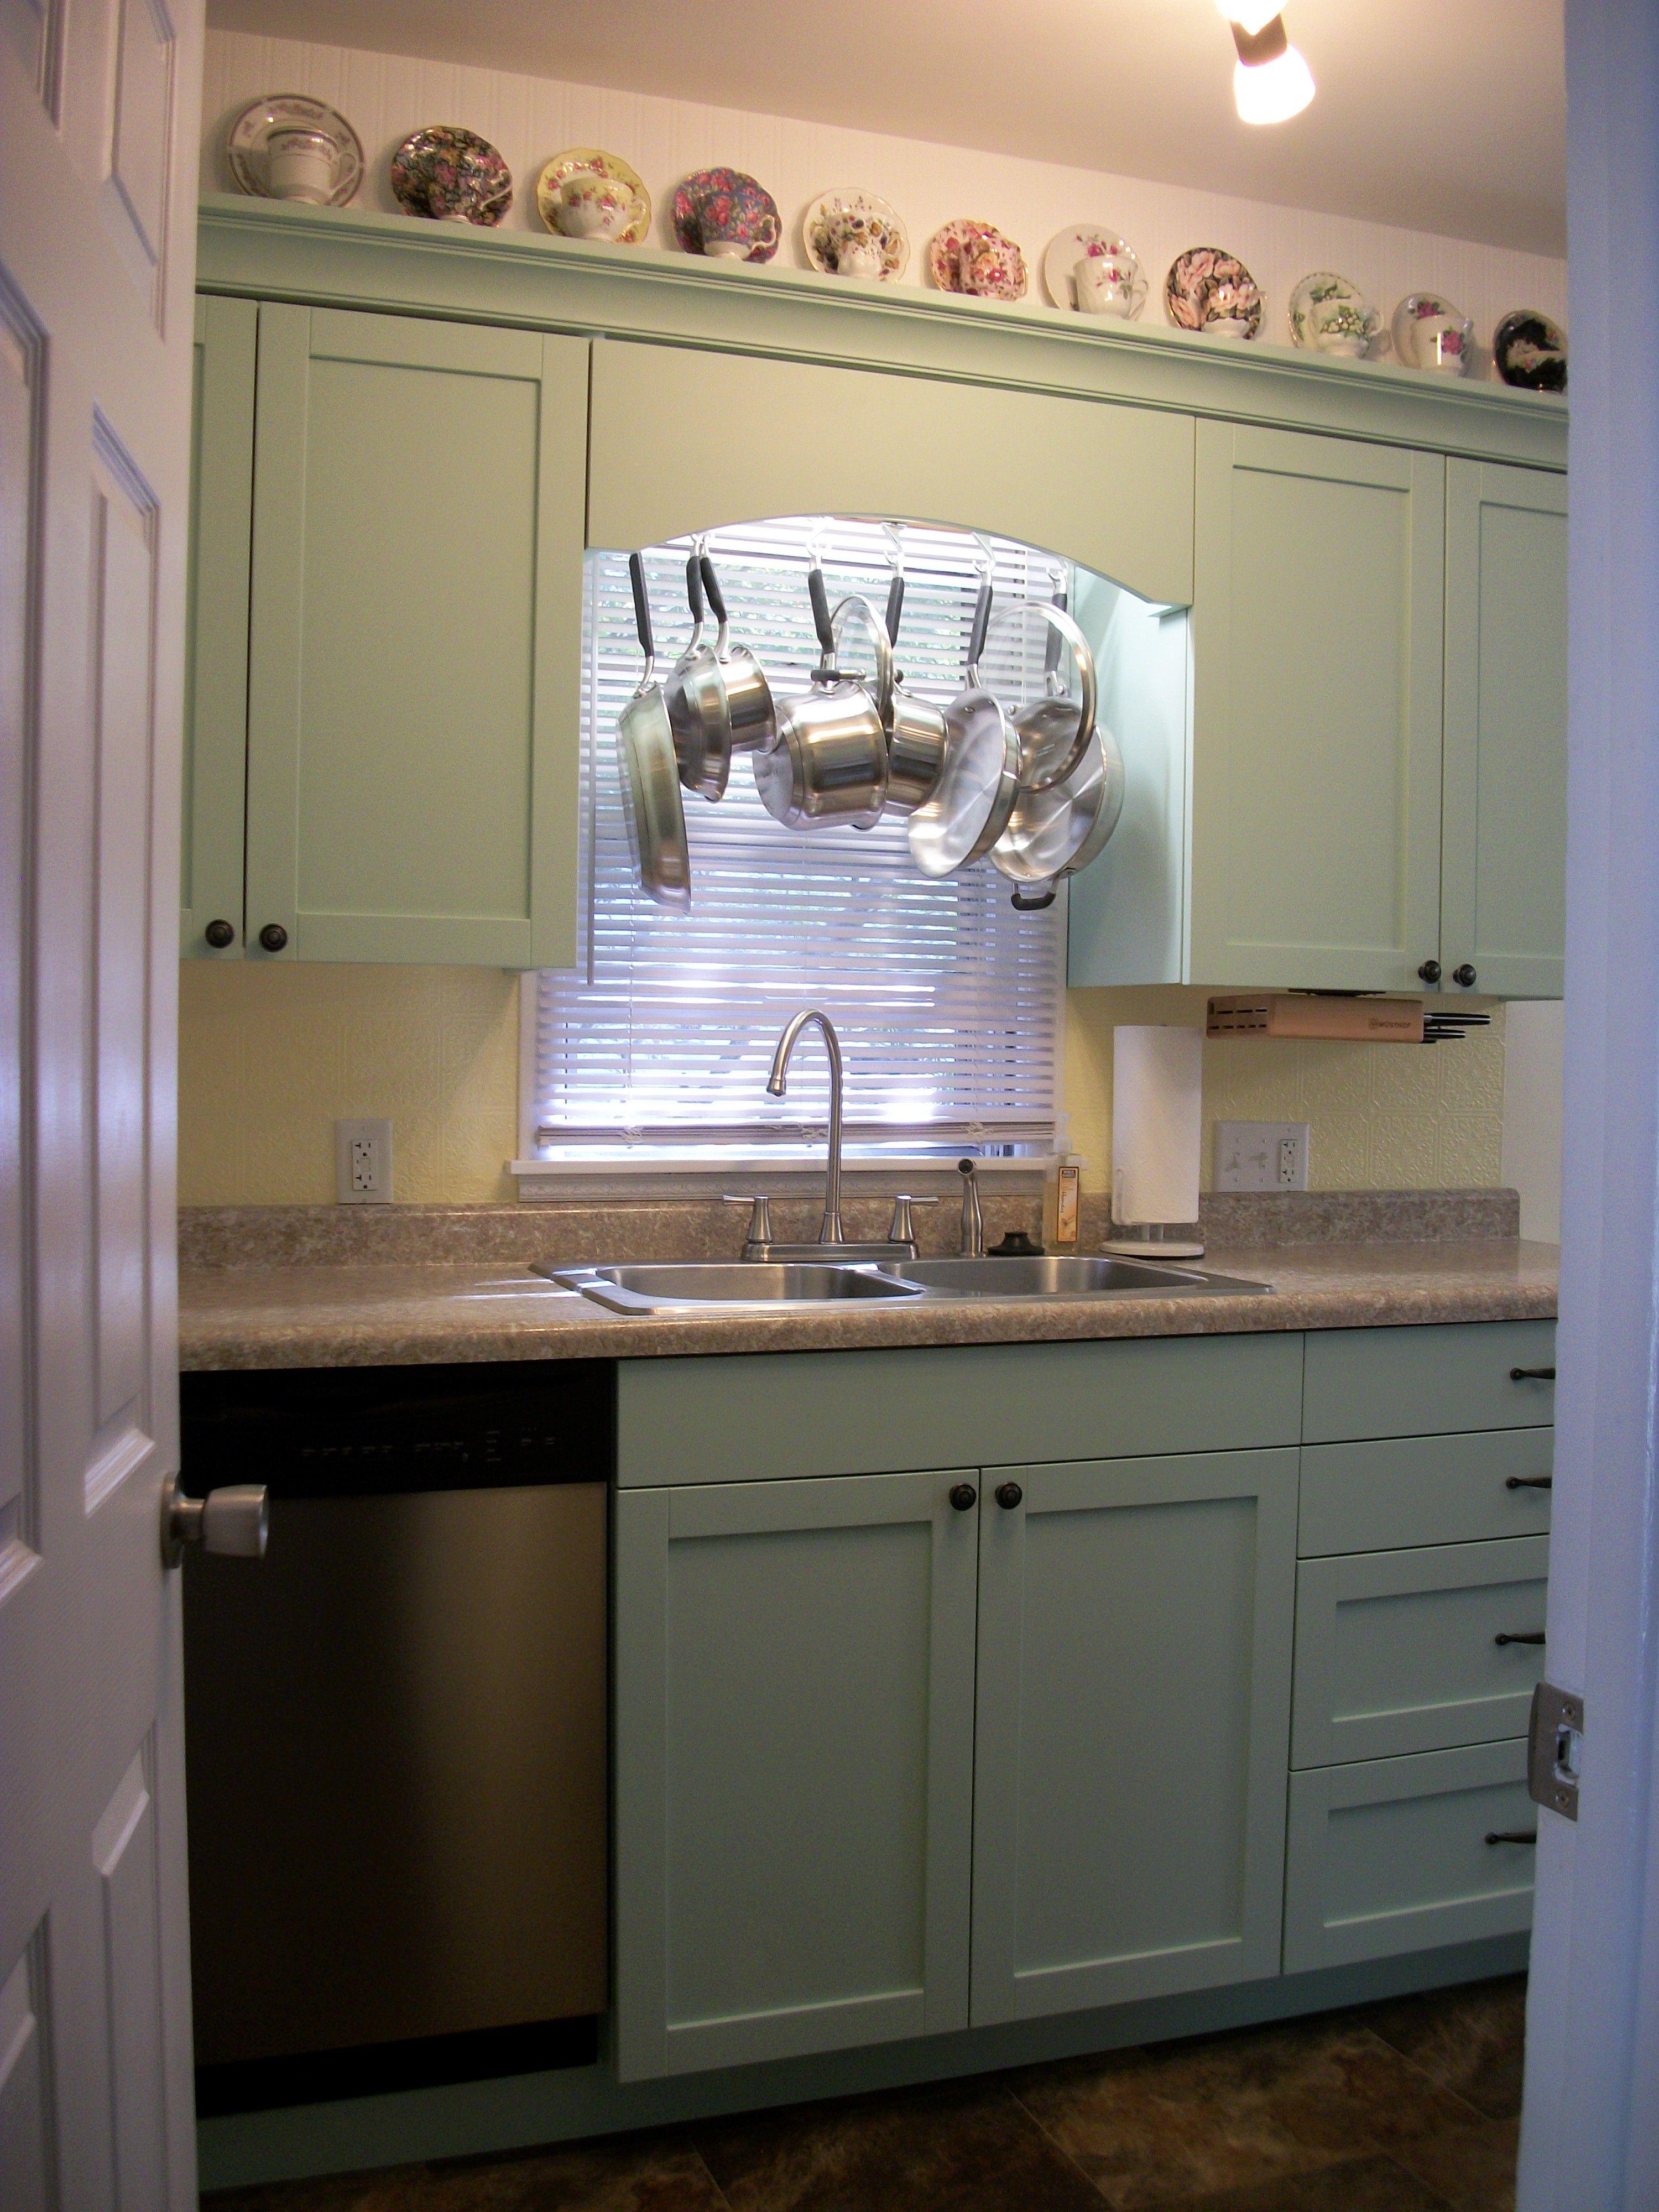 Elegant Pin By Carollynn K On Kitchen Reno 2015 | Pinterest | Kitchen, Home And Pot  Rack